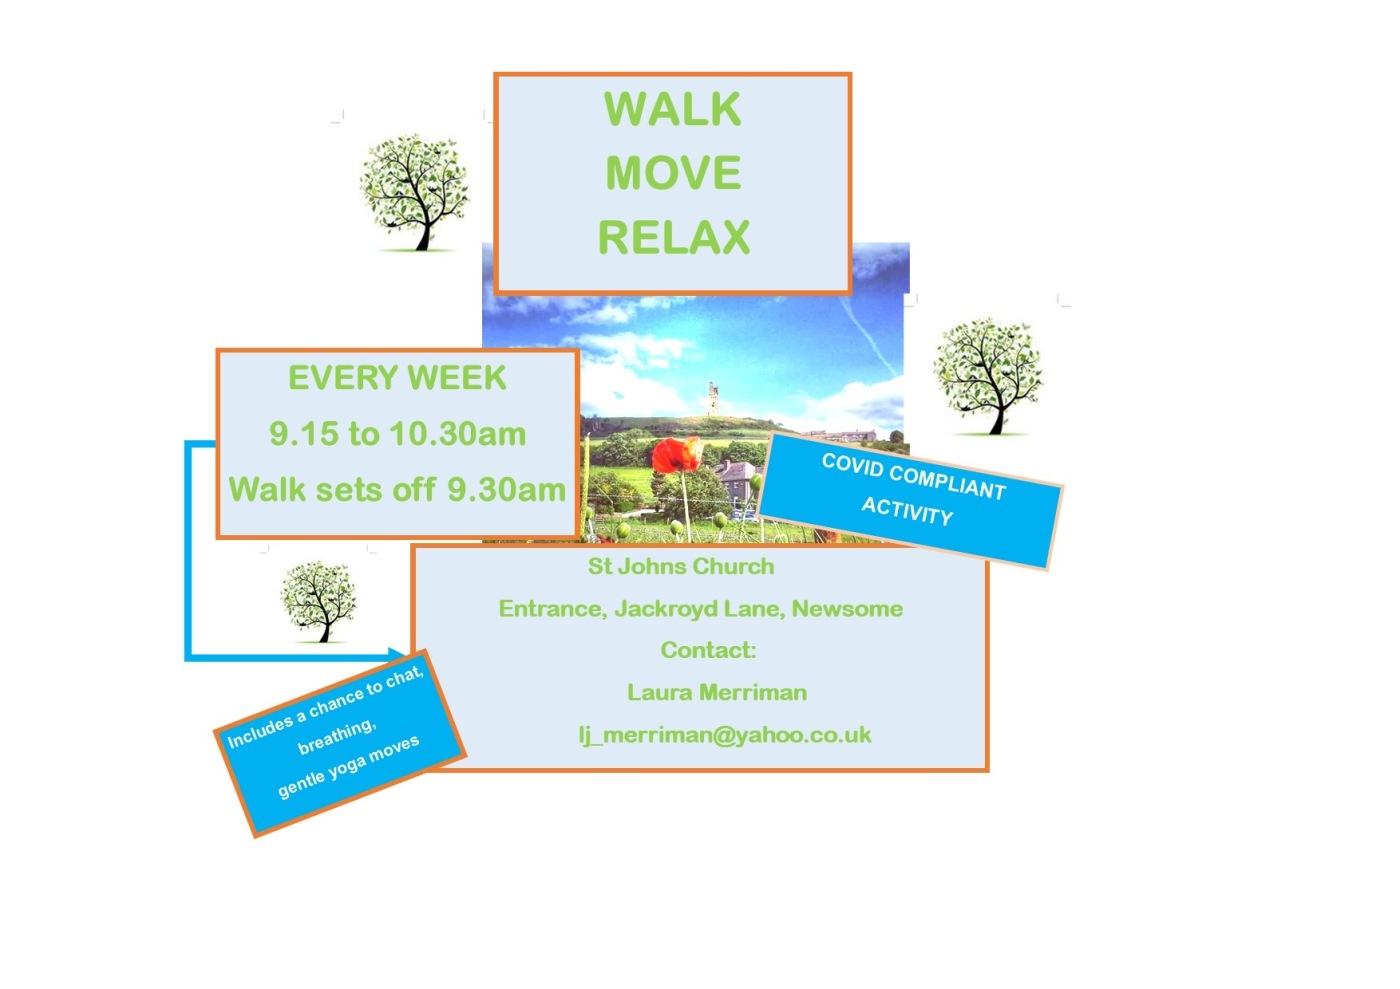 Move, walk, relax